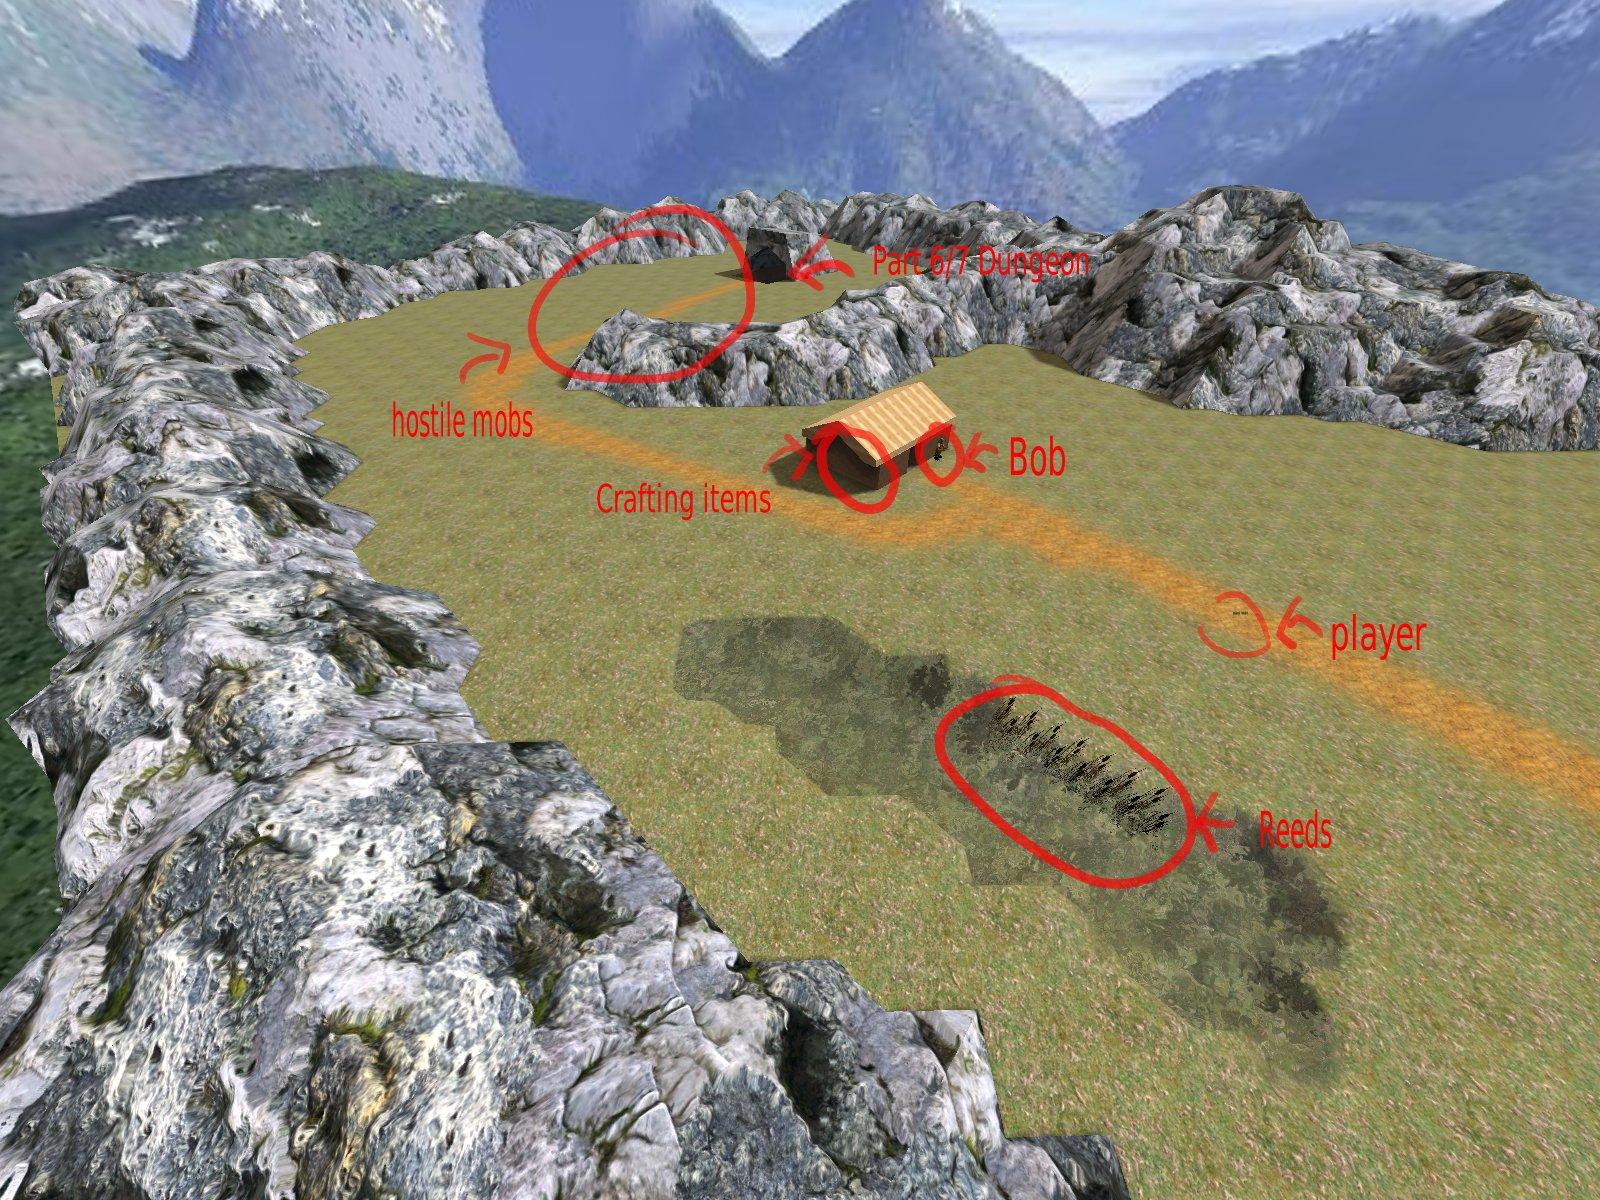 Filerpg tutorial mapg platinum arts sandbox free 3d game maker filerpg tutorial mapg baditri Gallery